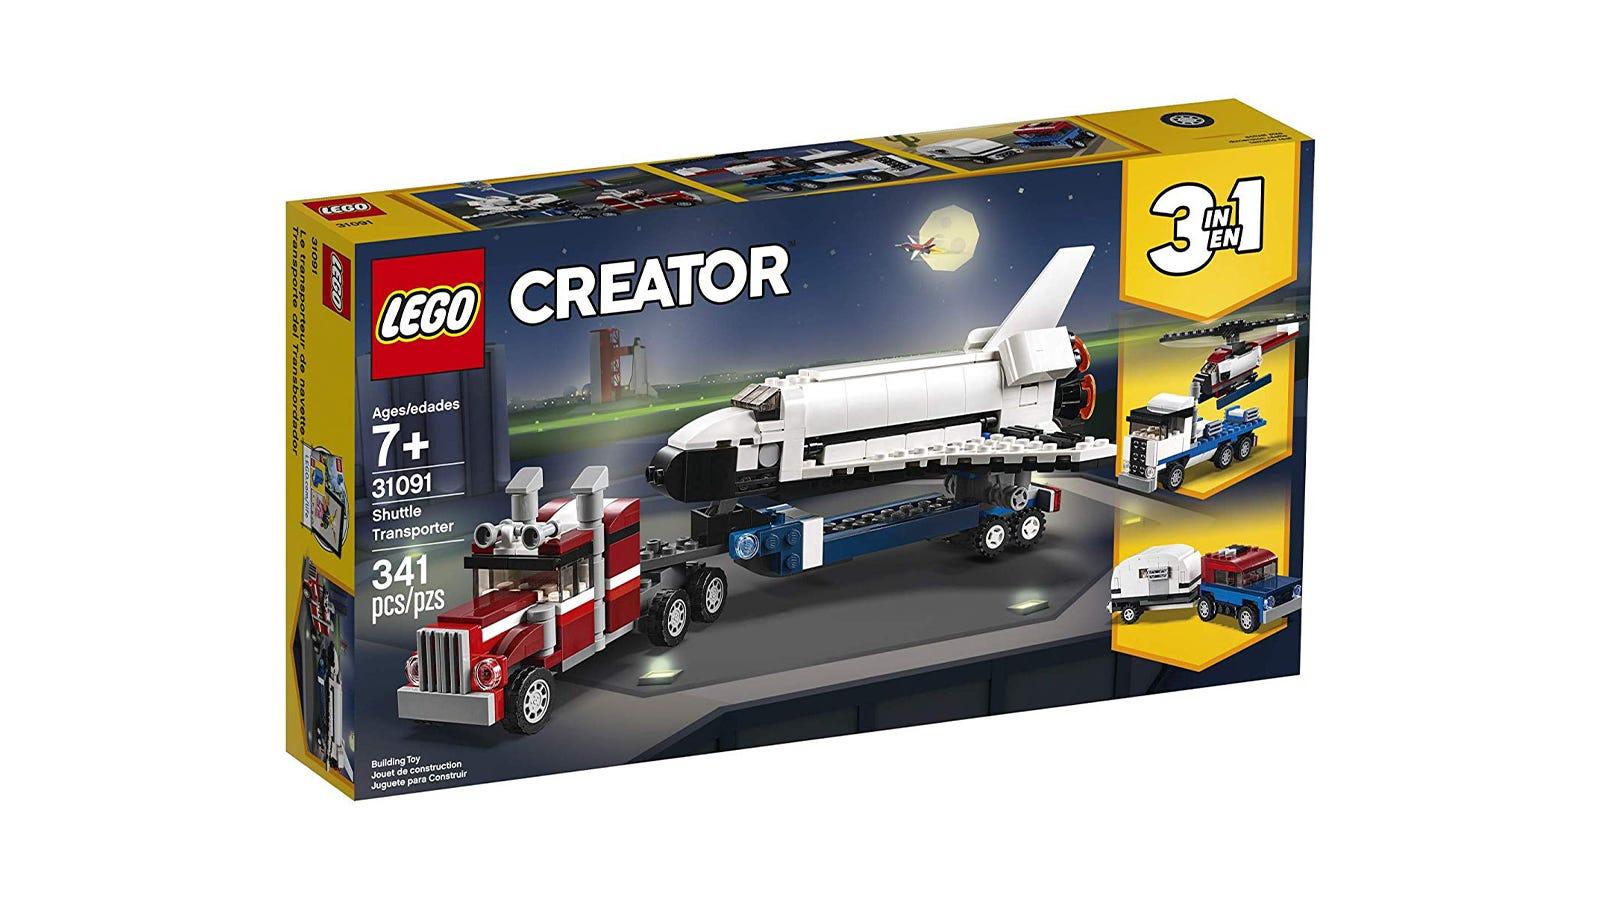 LEGO Creator 3in1 Space Shuttle Transporter